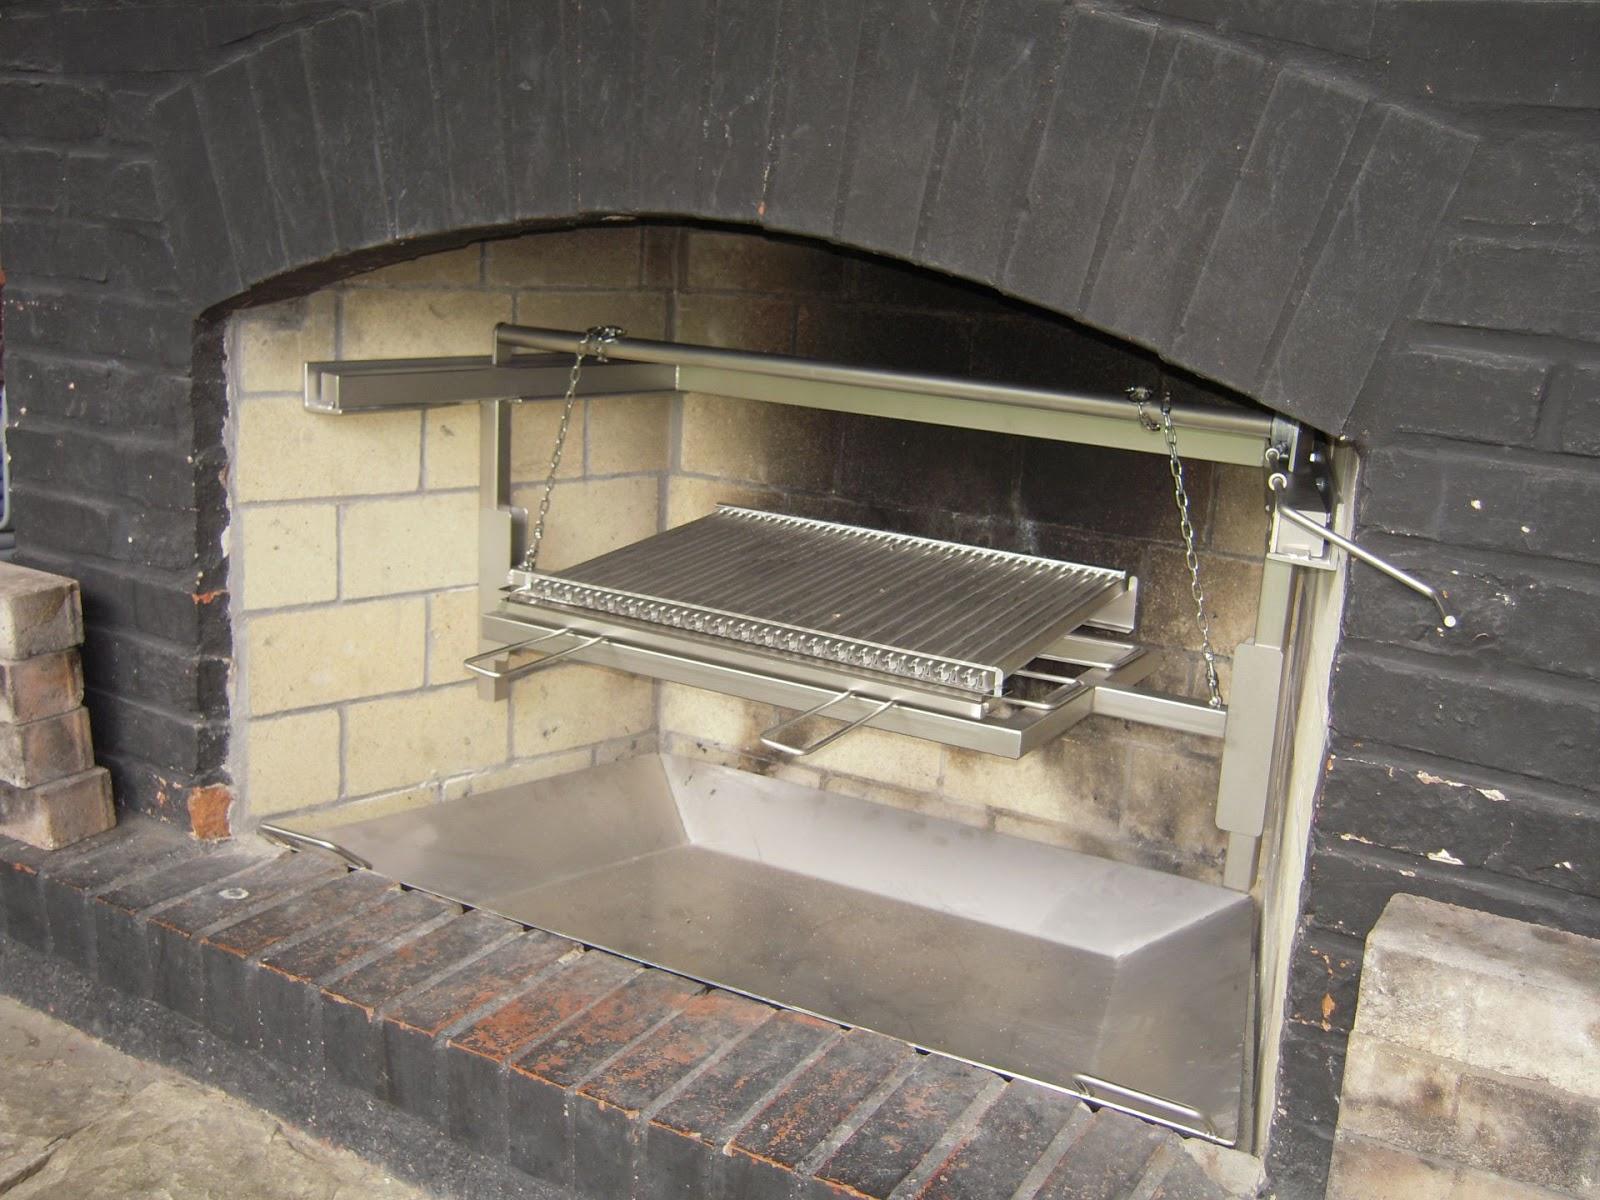 grill grillrost höhenverstellbar | frÖbel metallbau